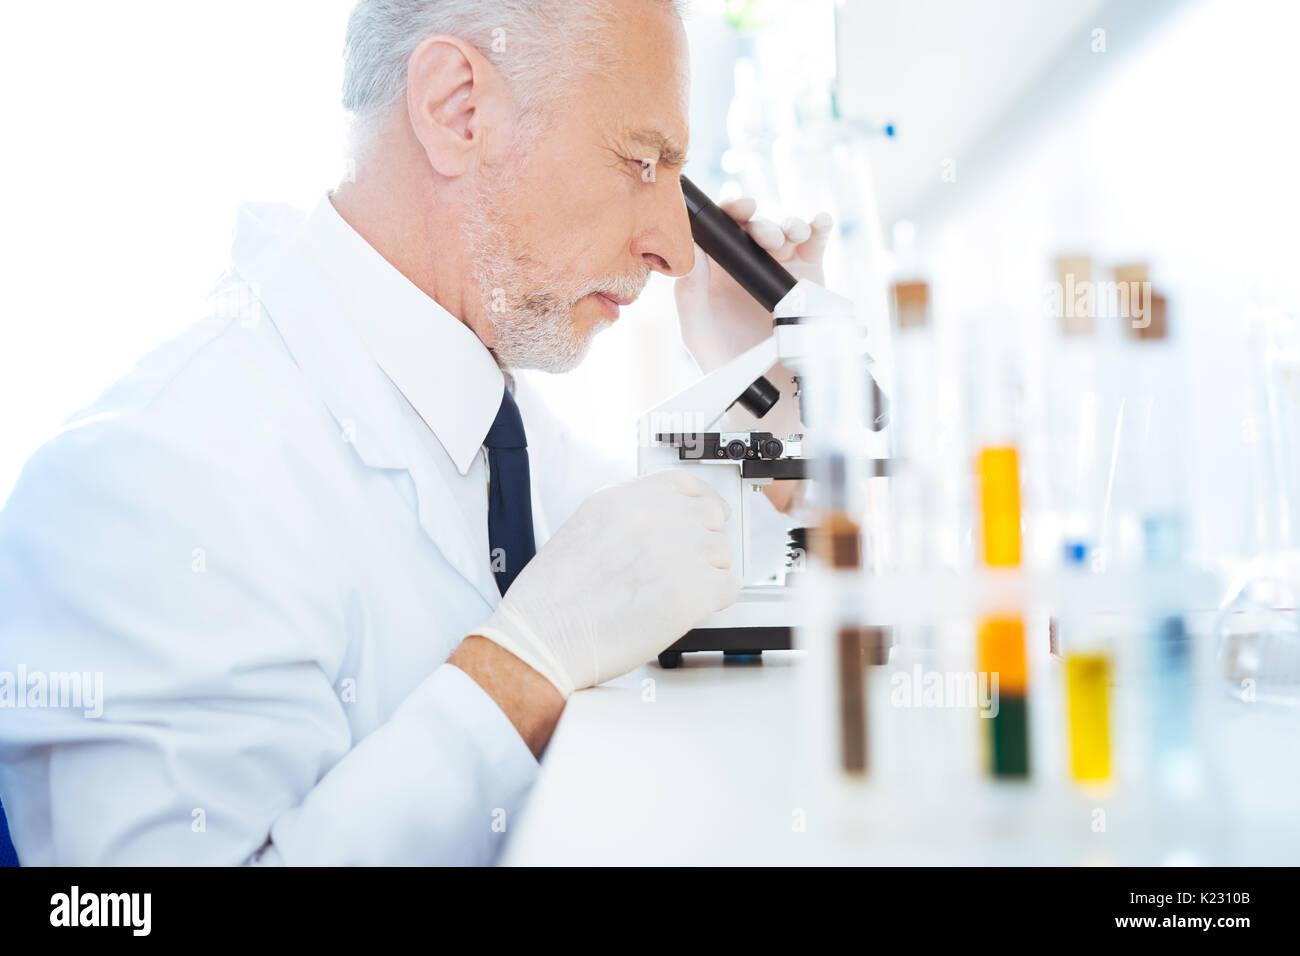 Aufmerksame Praktiker arbeiten mit Mikroskop Stockbild